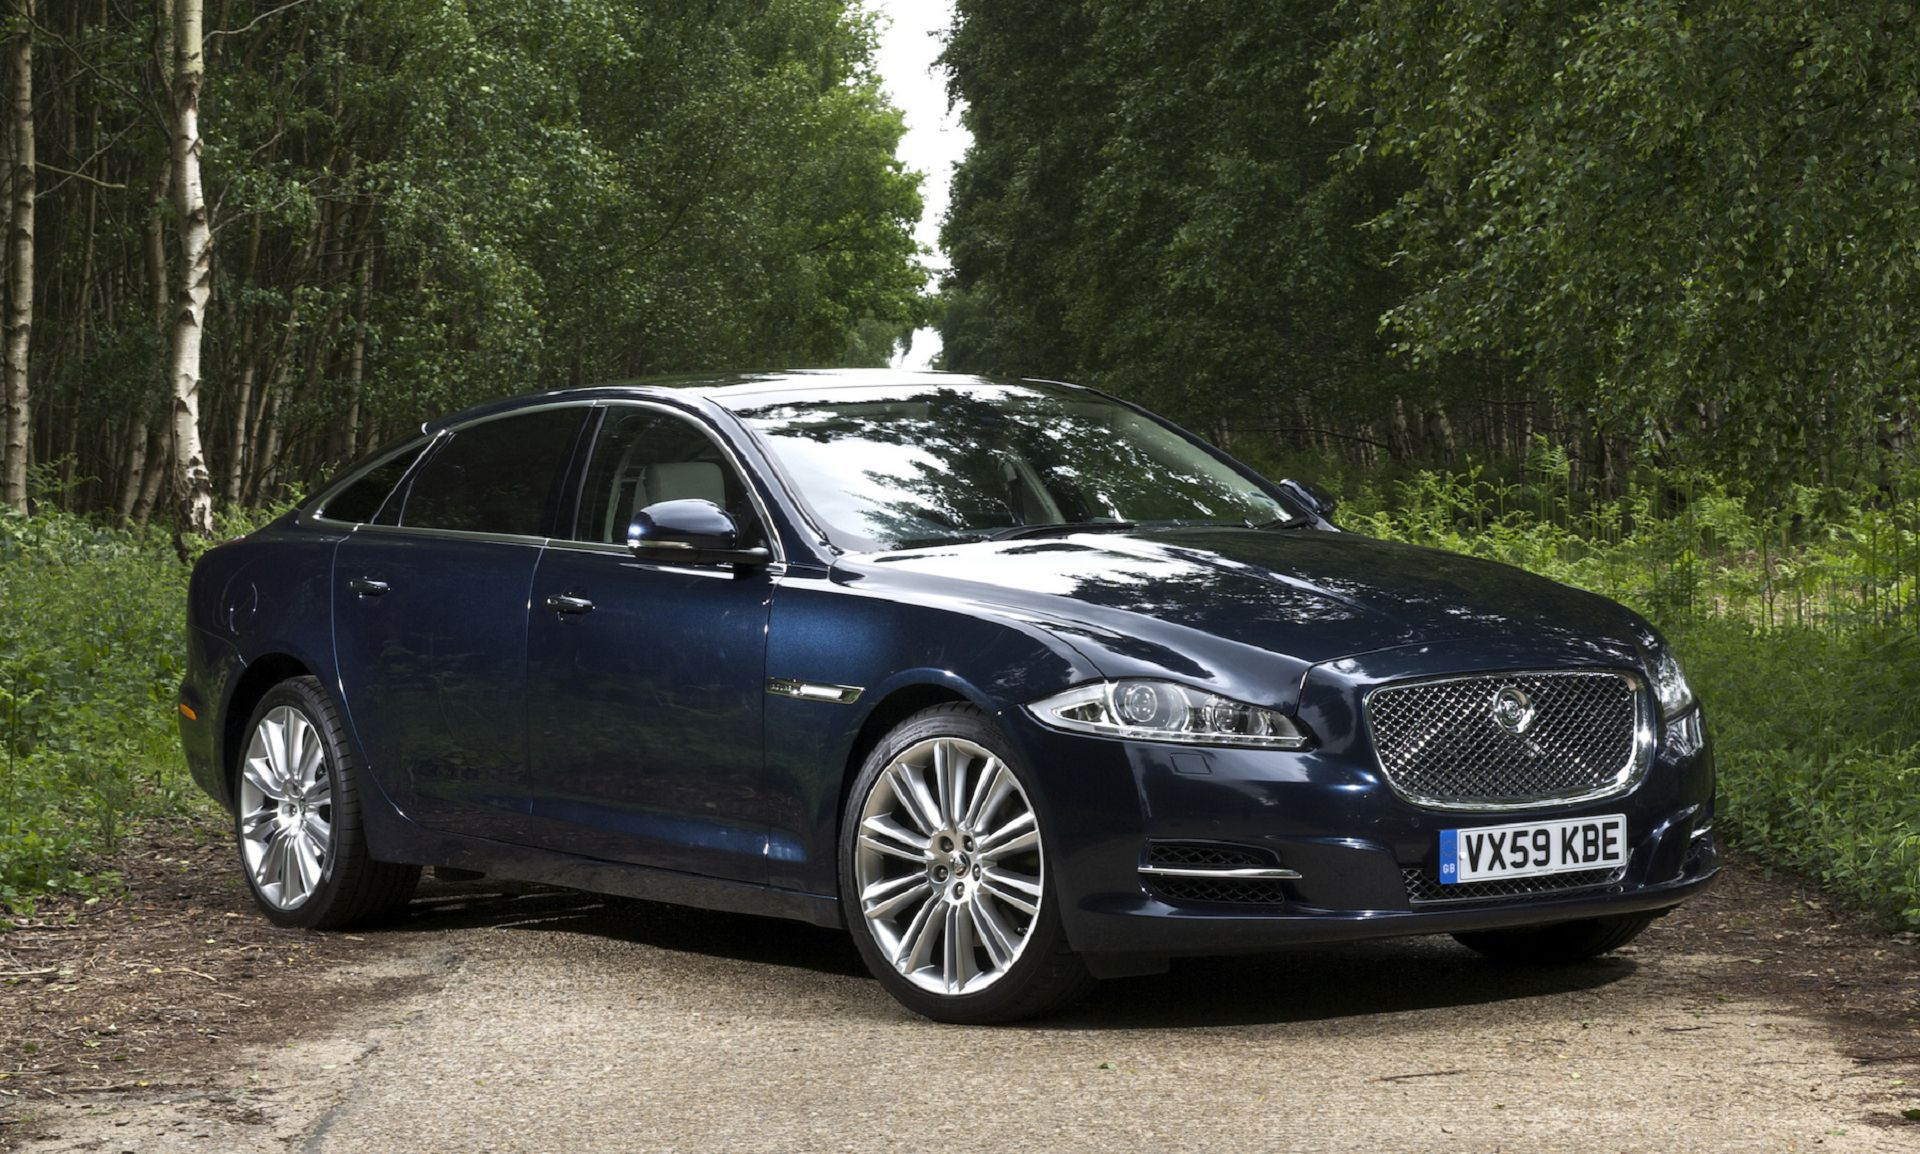 Jaguar Xj High Quality Wallpapers